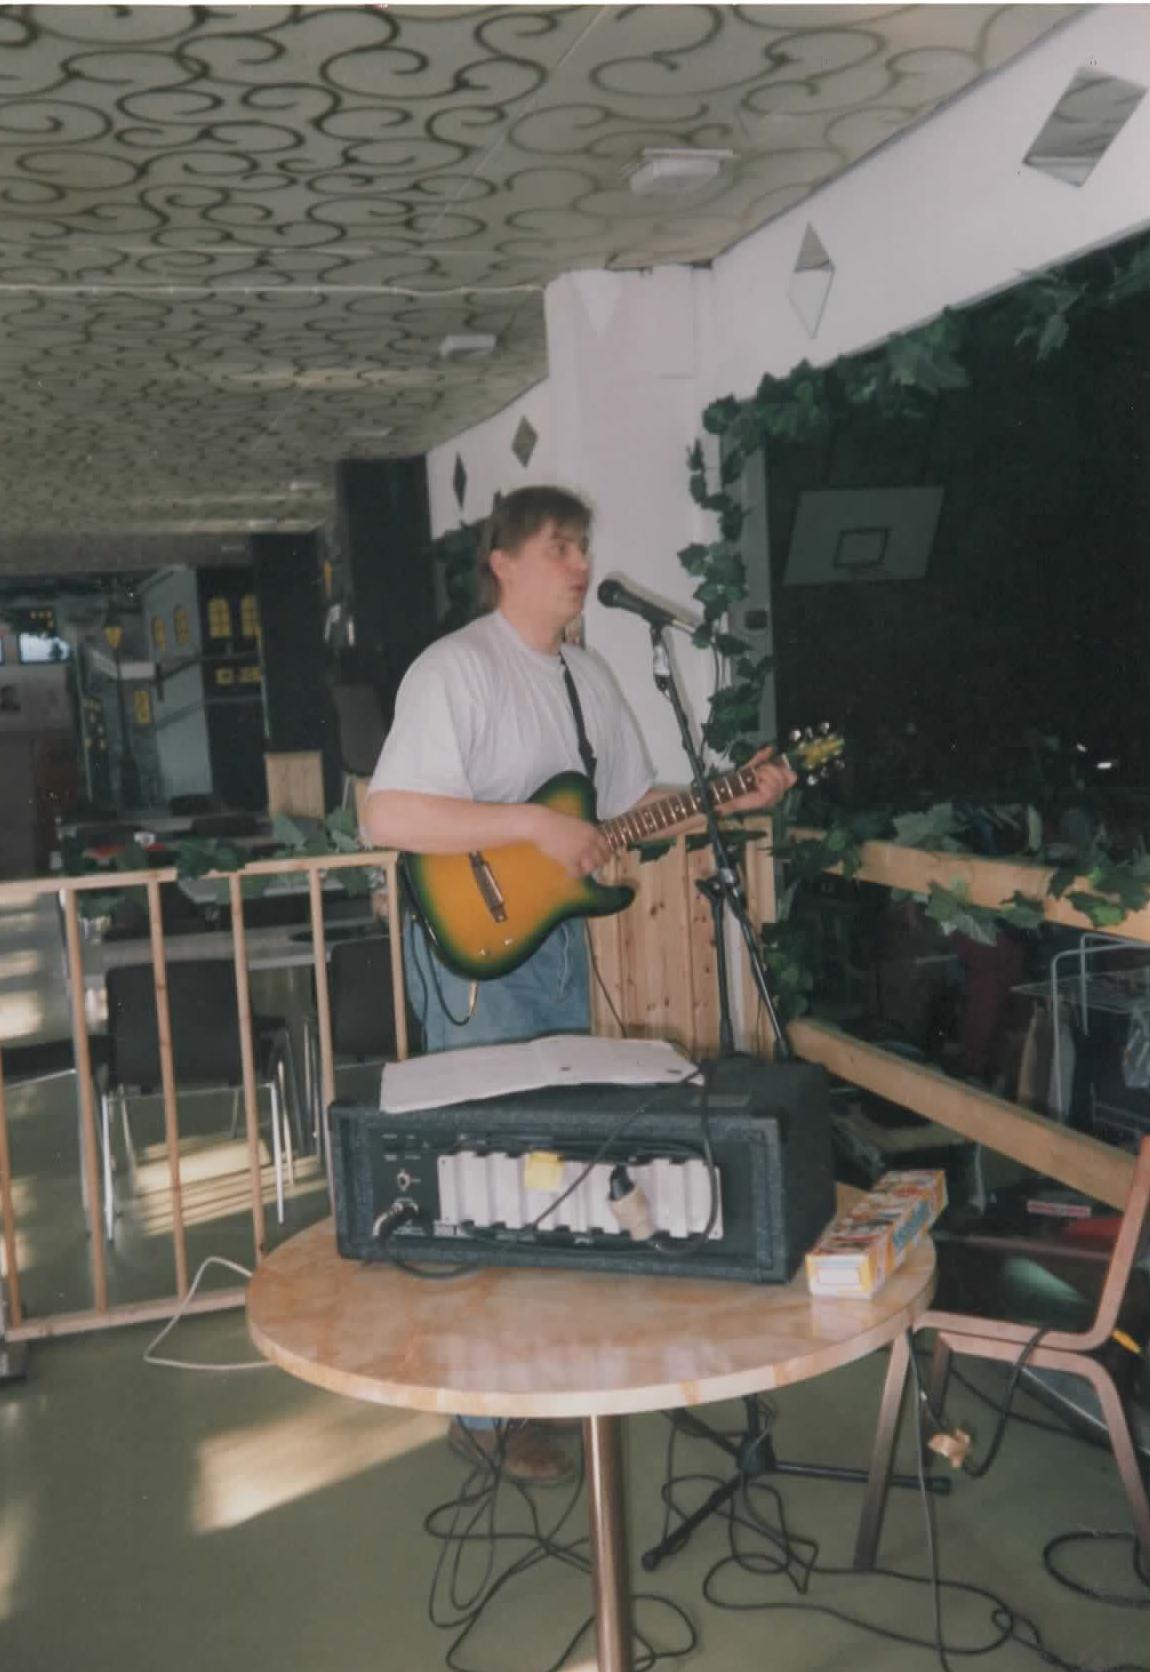 Ile Jokinen - The Shop